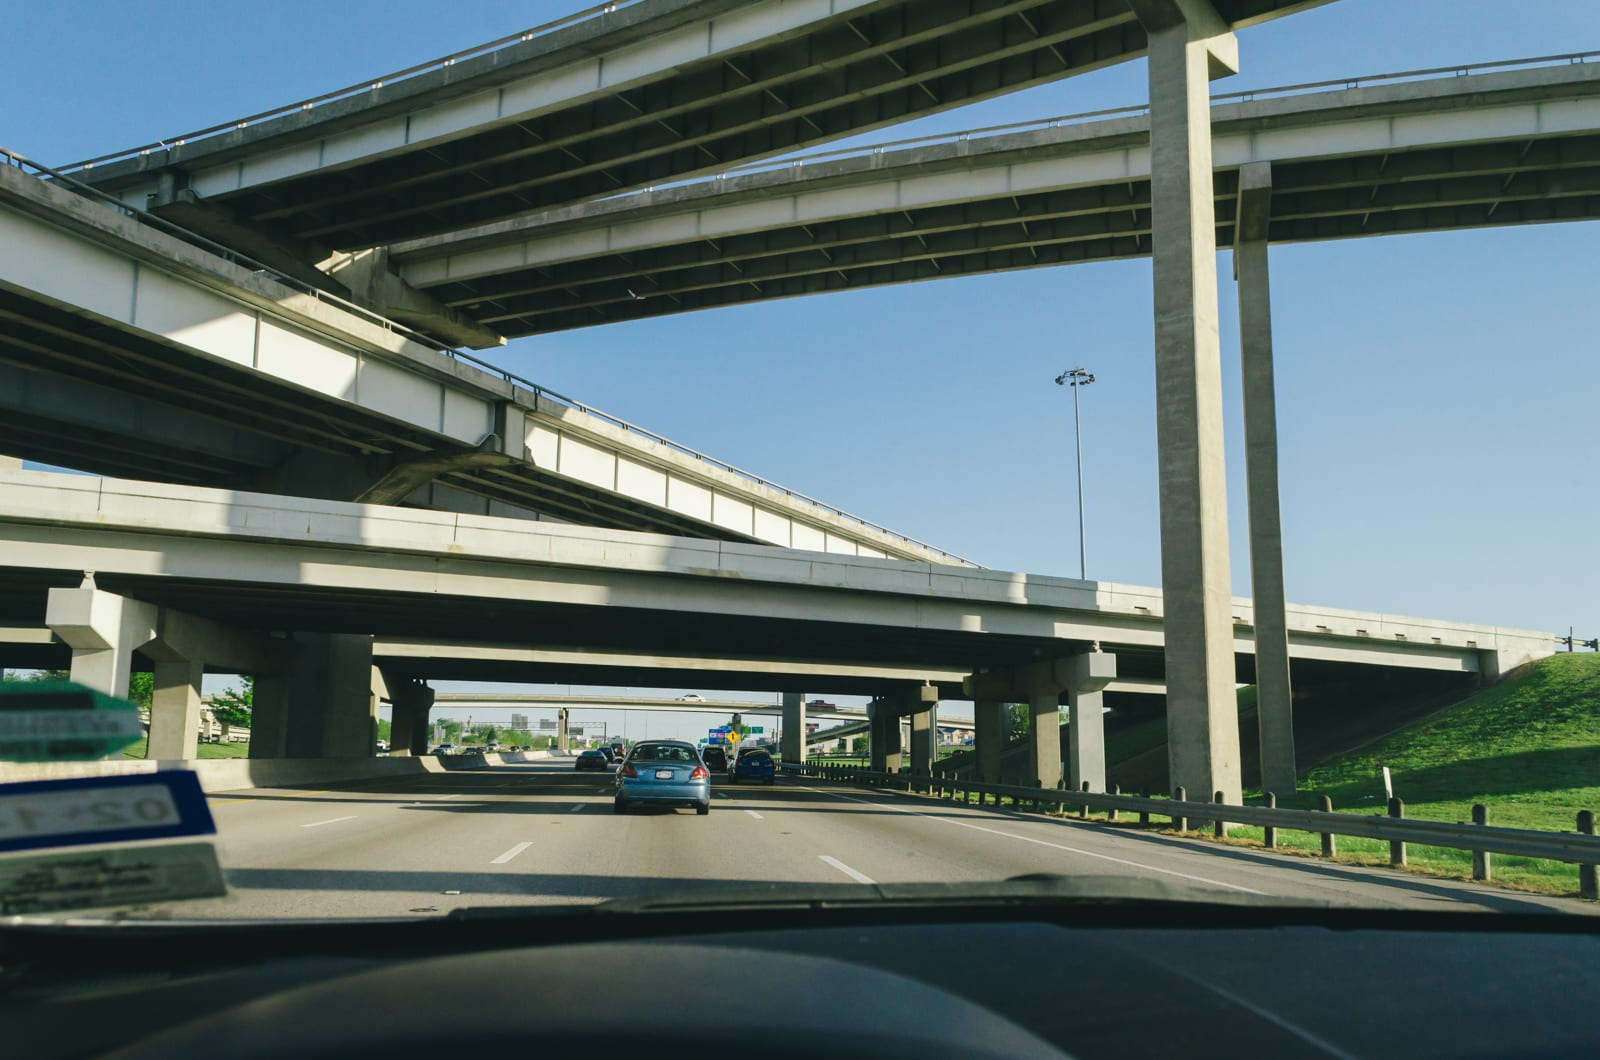 Overlapping bridges on highway 75